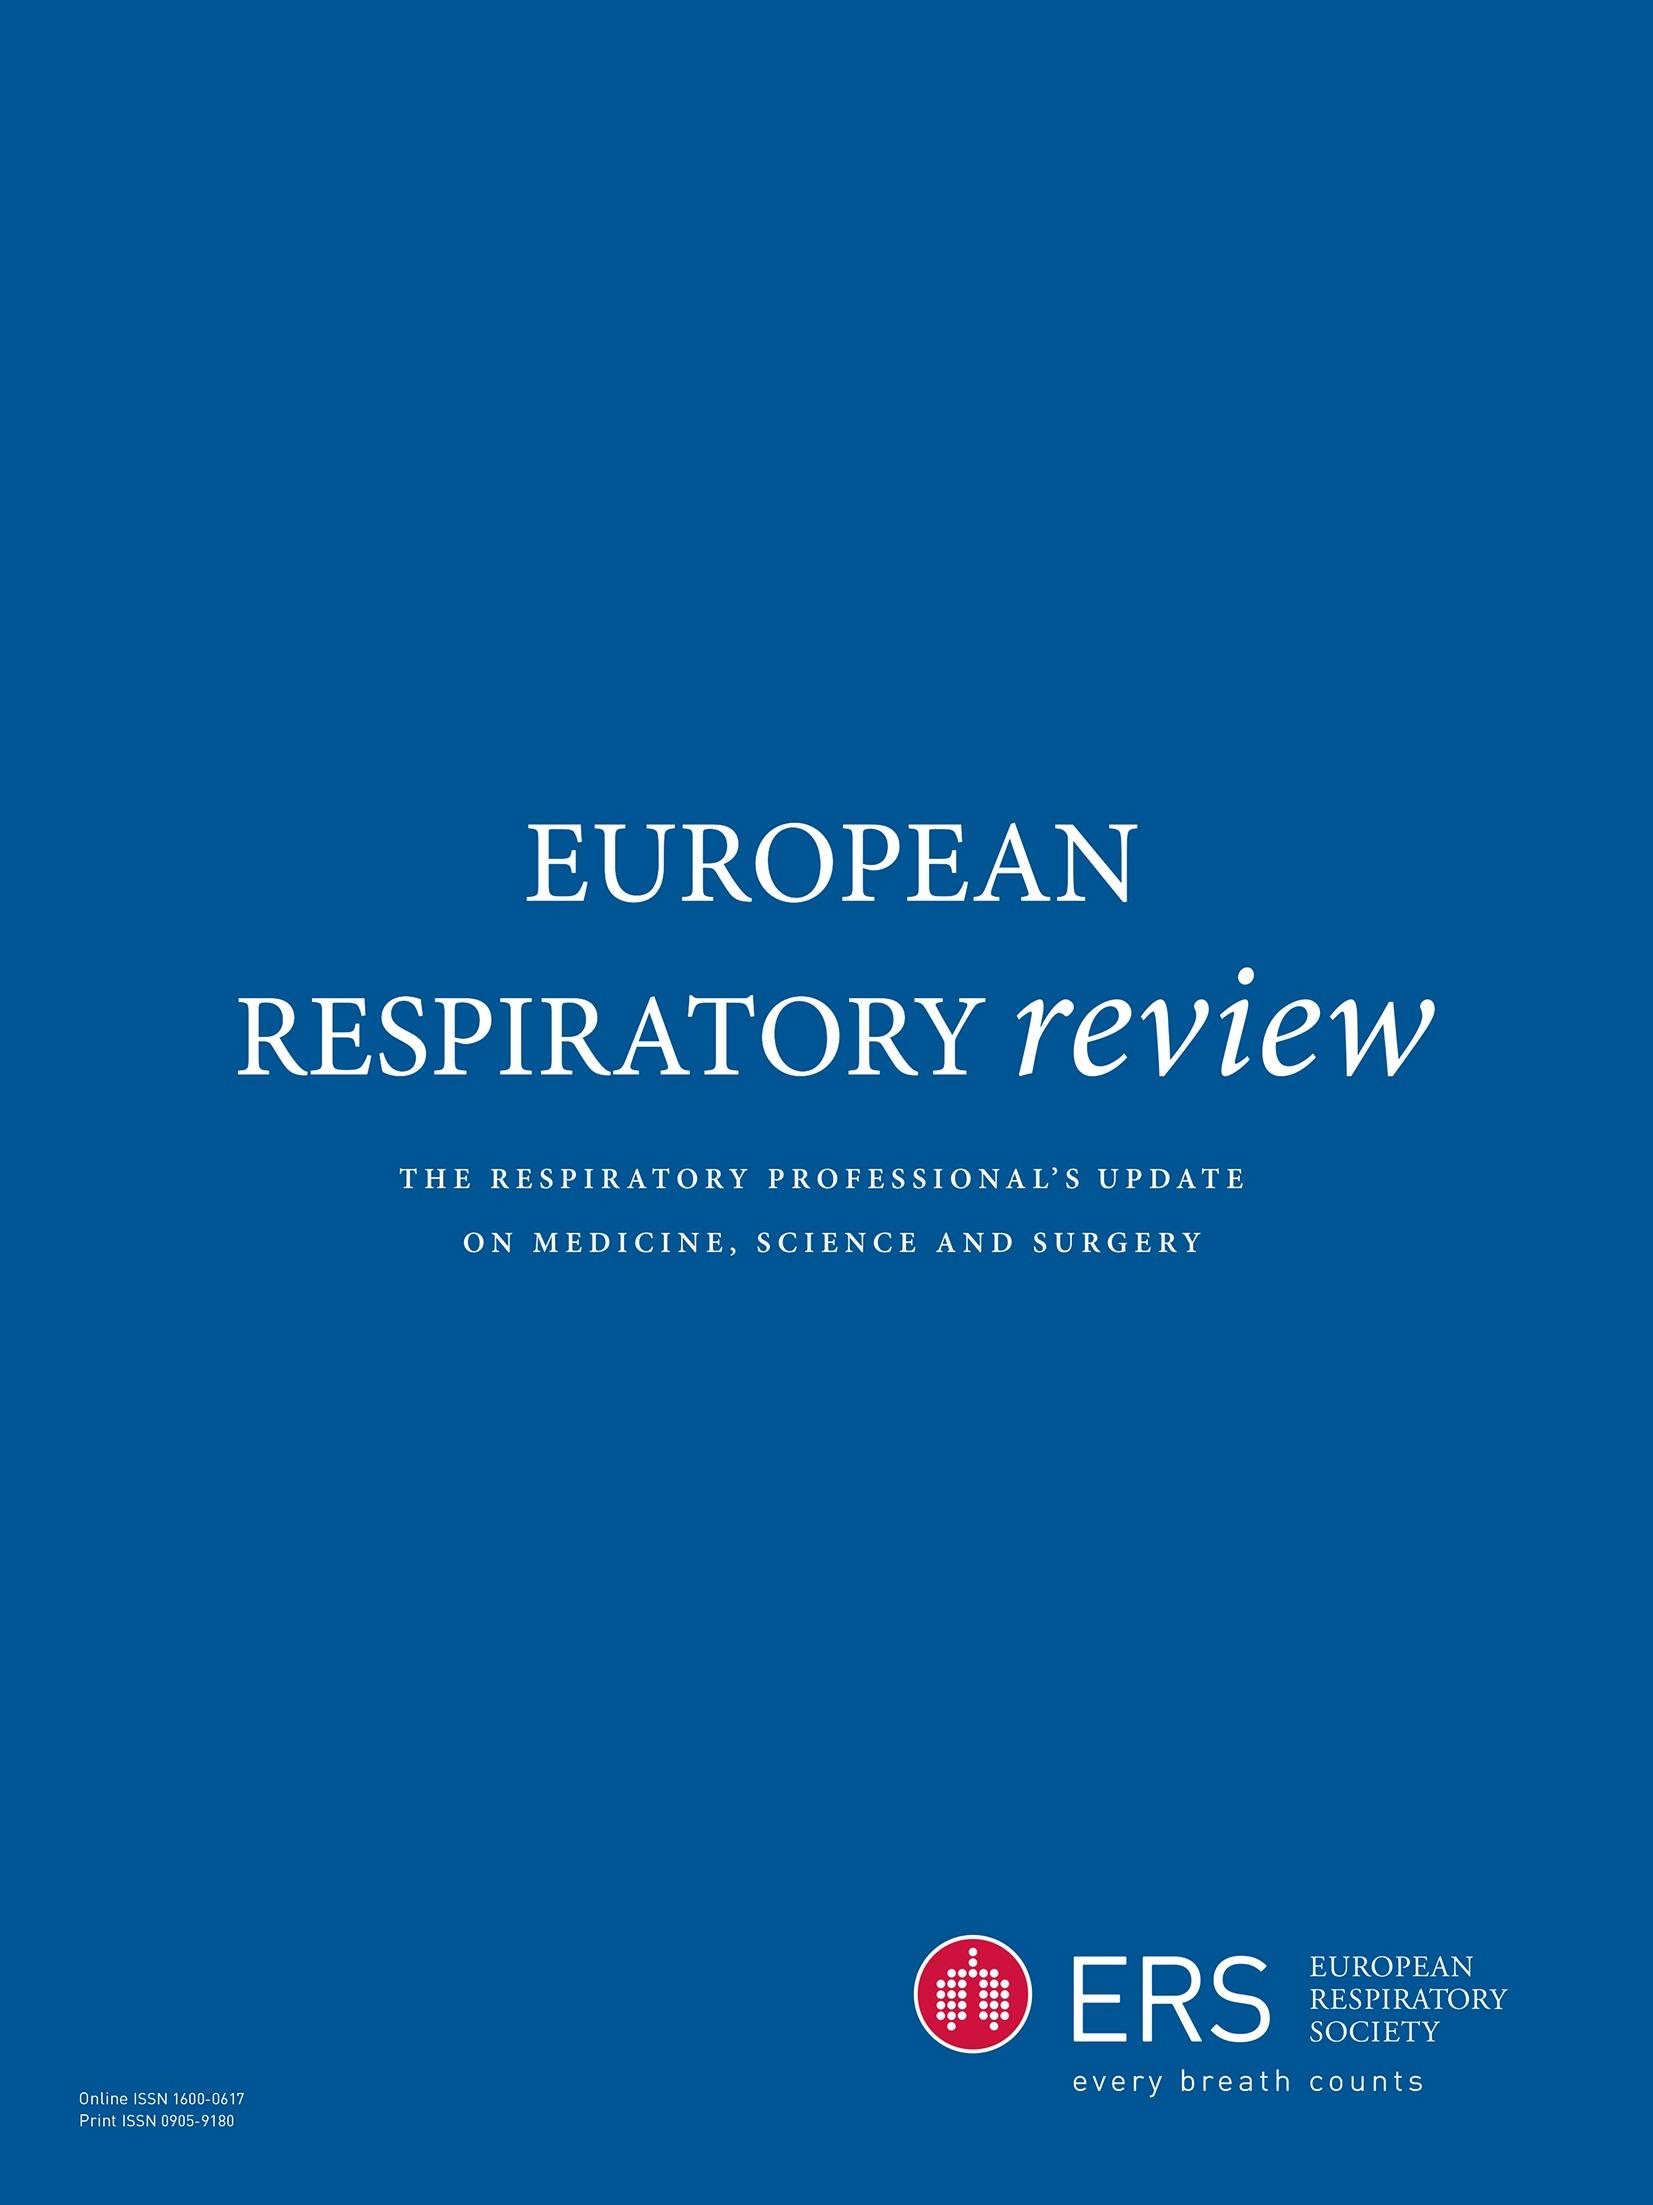 Palliative care in pulmonary arterial hypertension: an